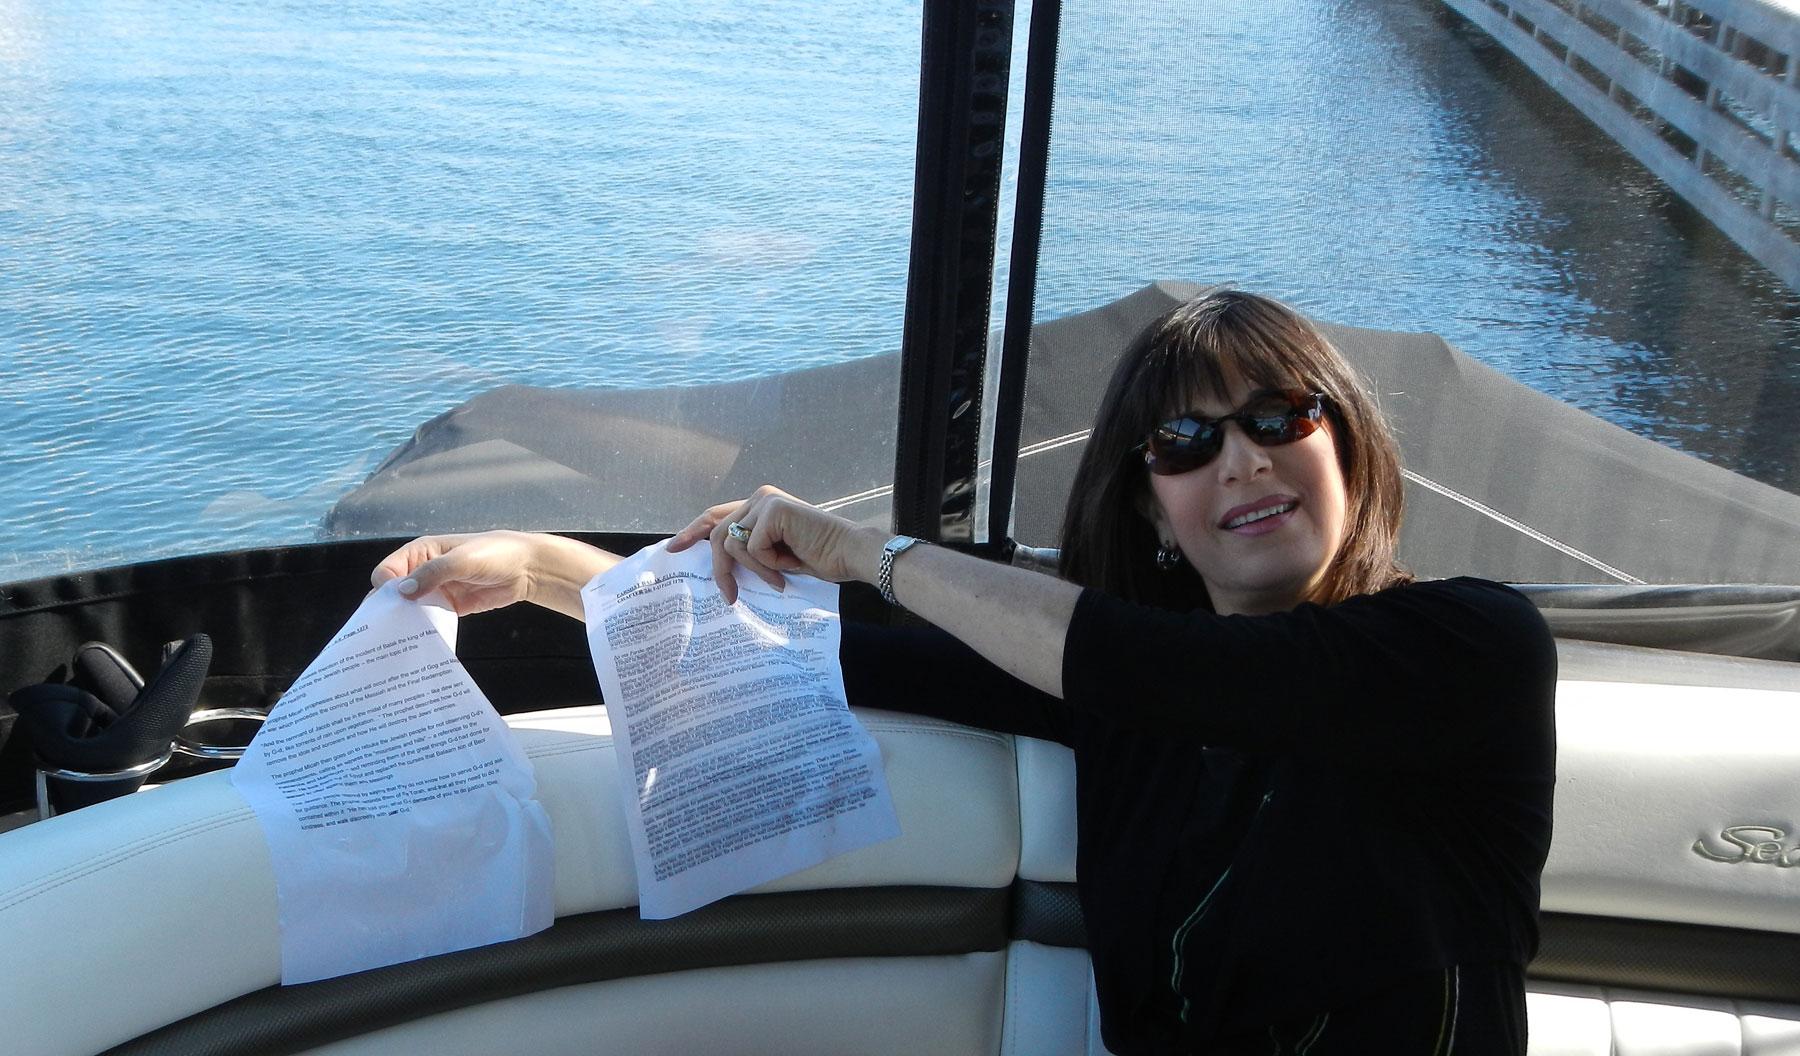 Audrey Kaufman with her soggy d'var torah